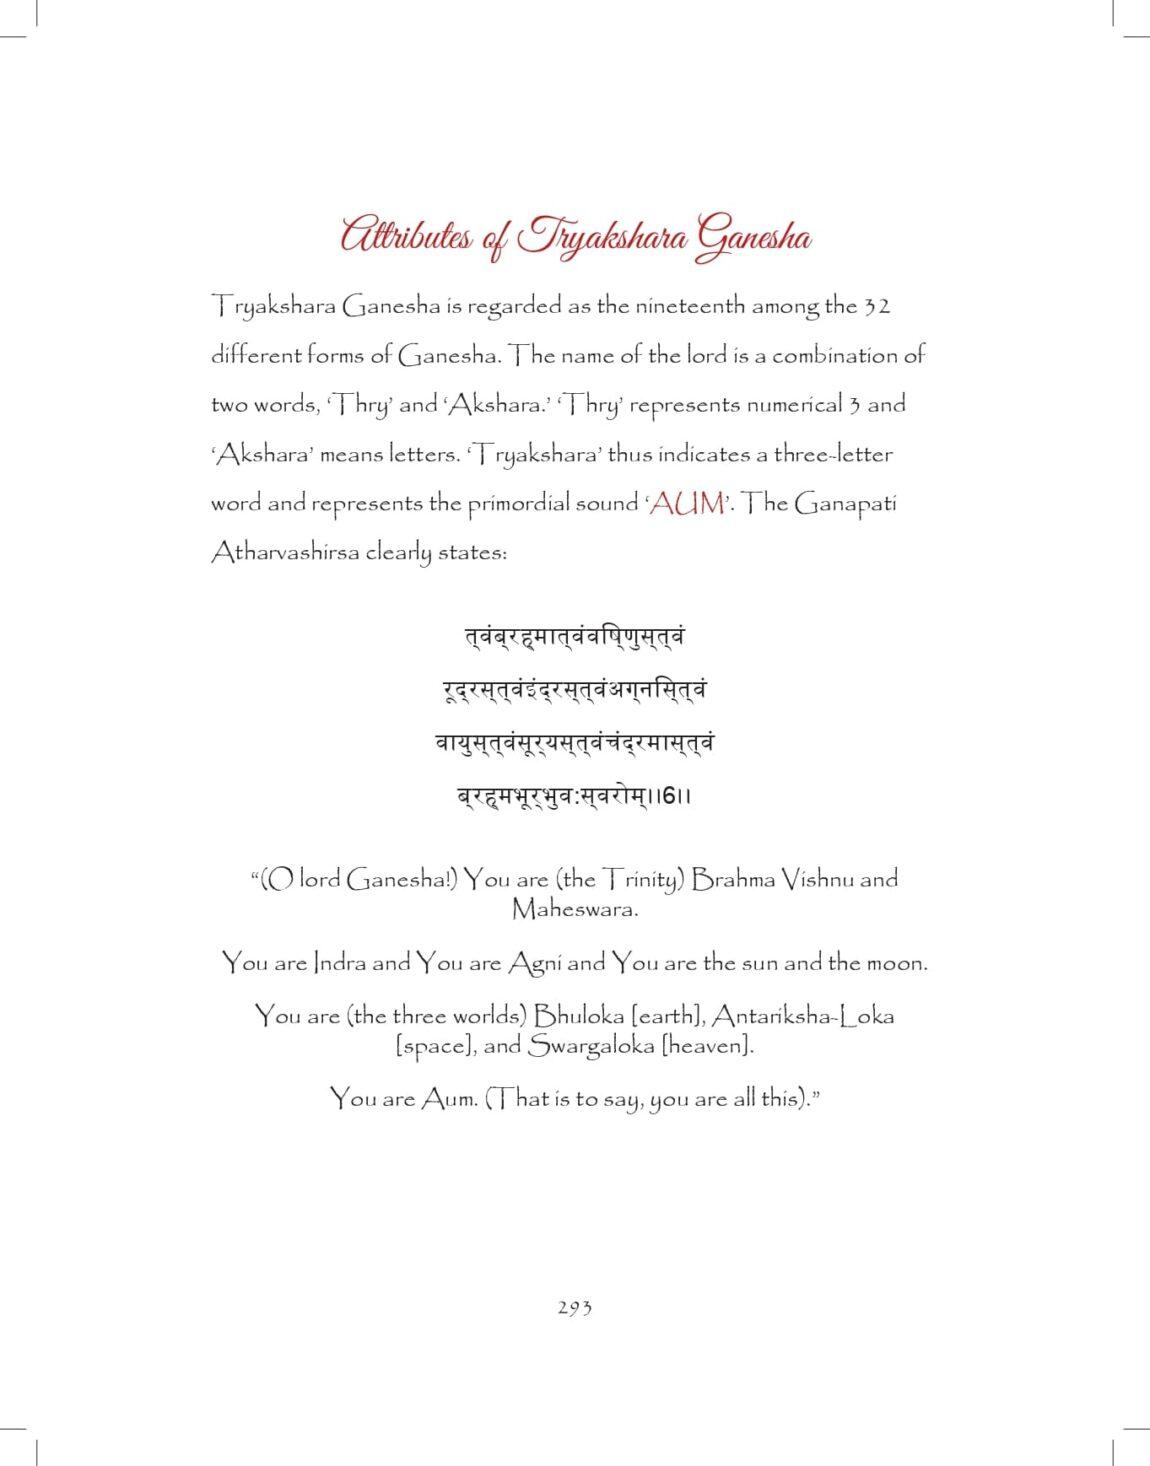 Ganesh-print_pages-to-jpg-0293.jpg